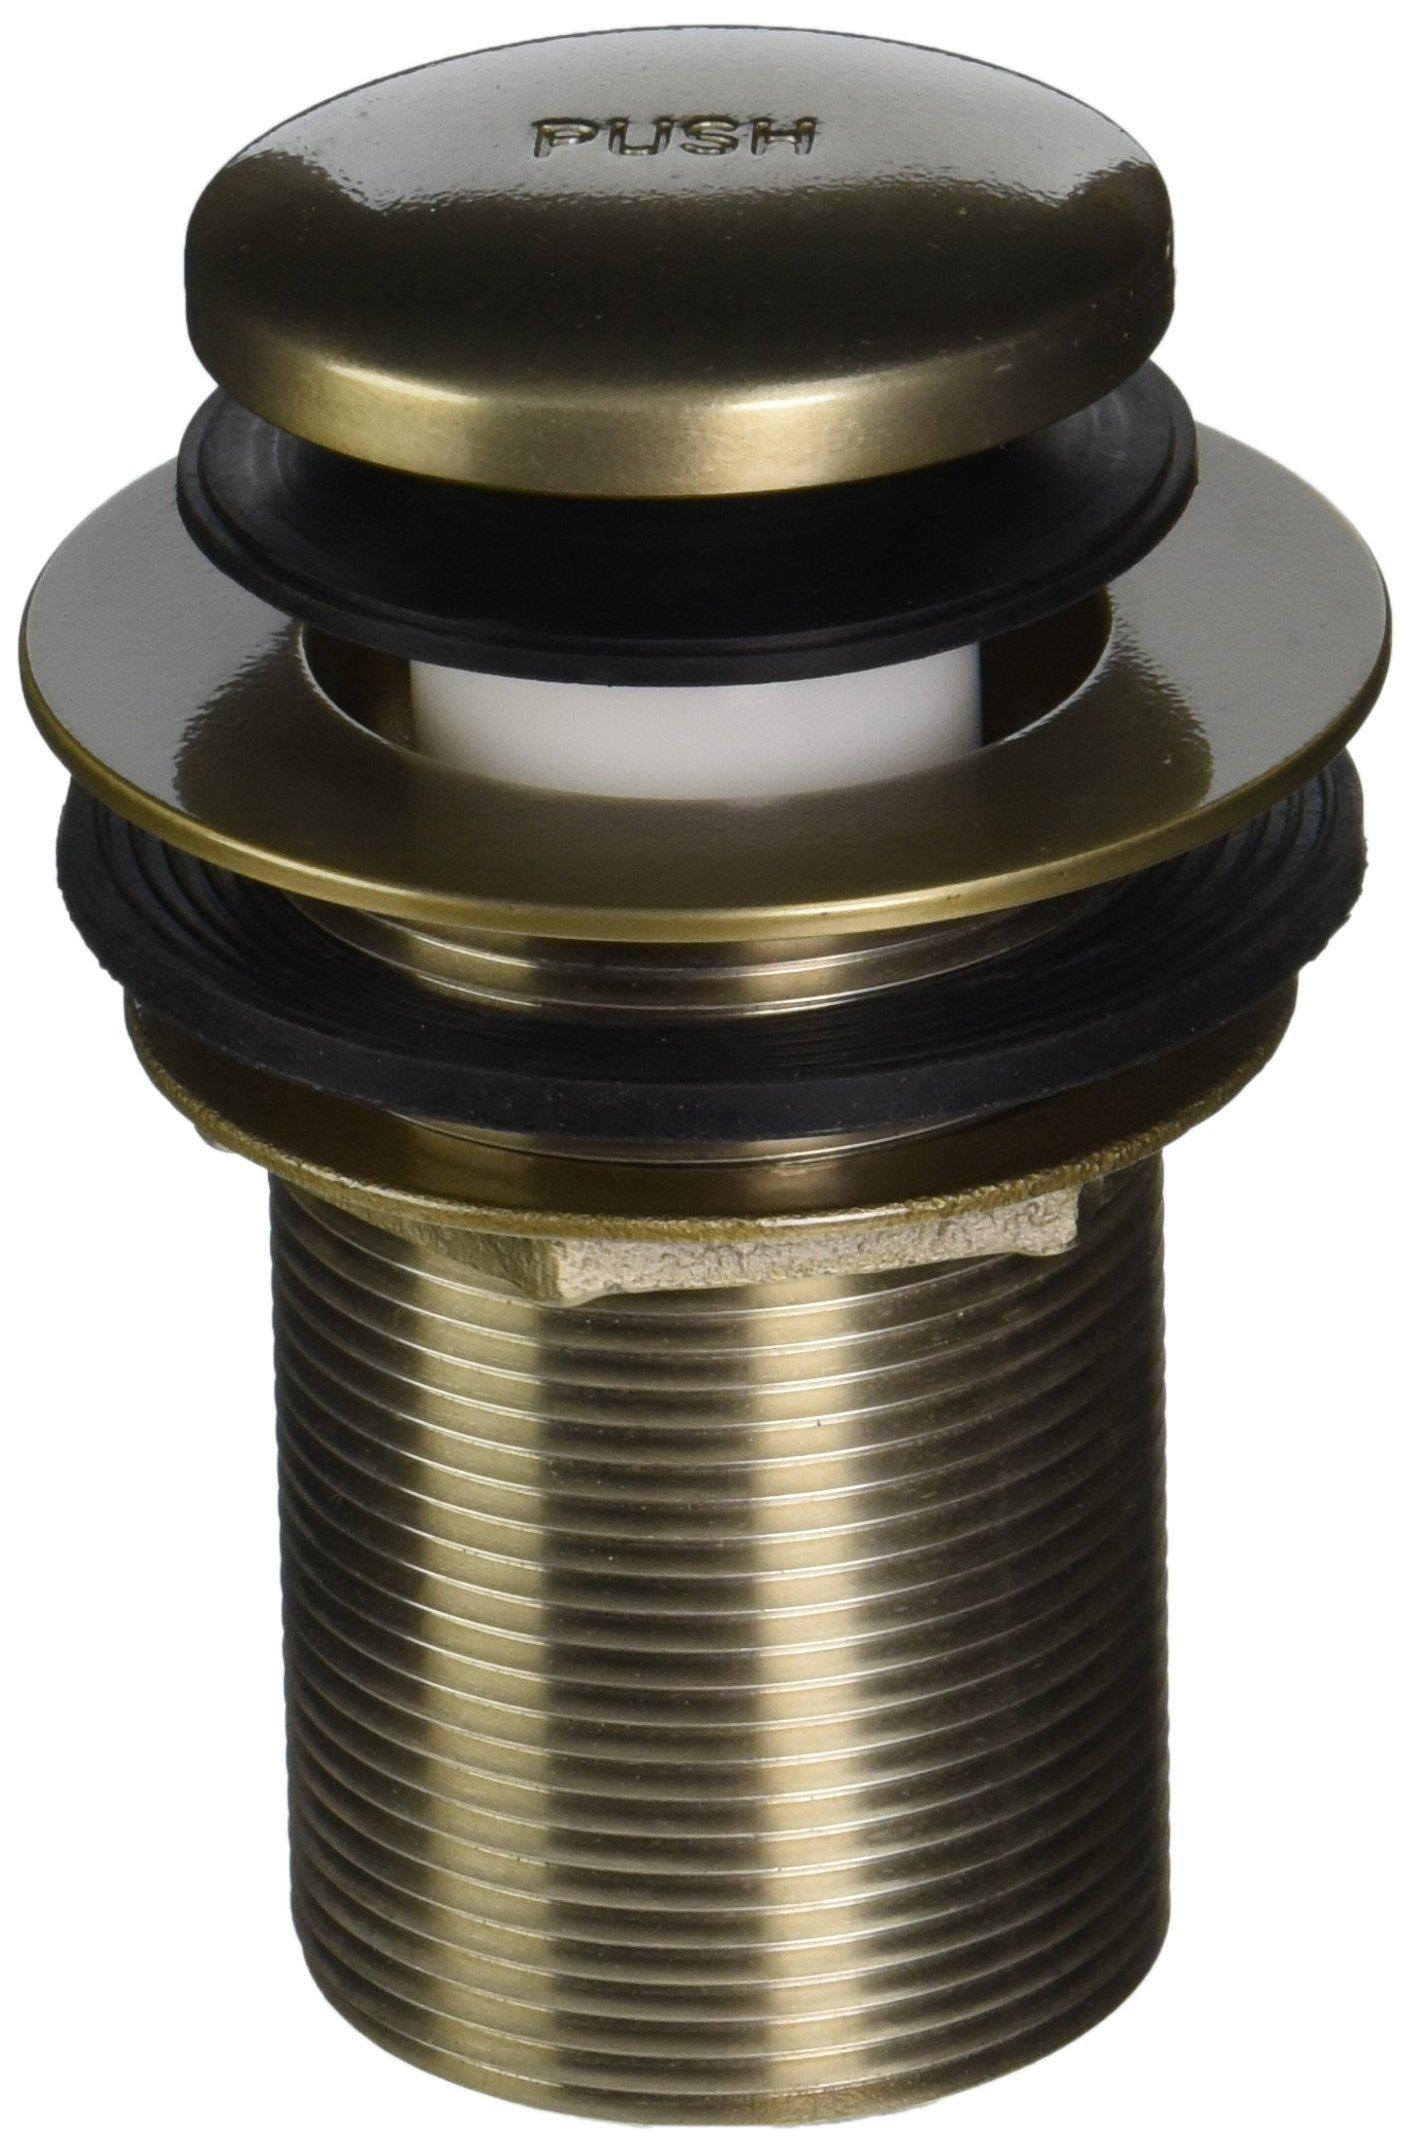 Jaclo 529-75-BU Toe Control Drain Strainer, Bronze Umber